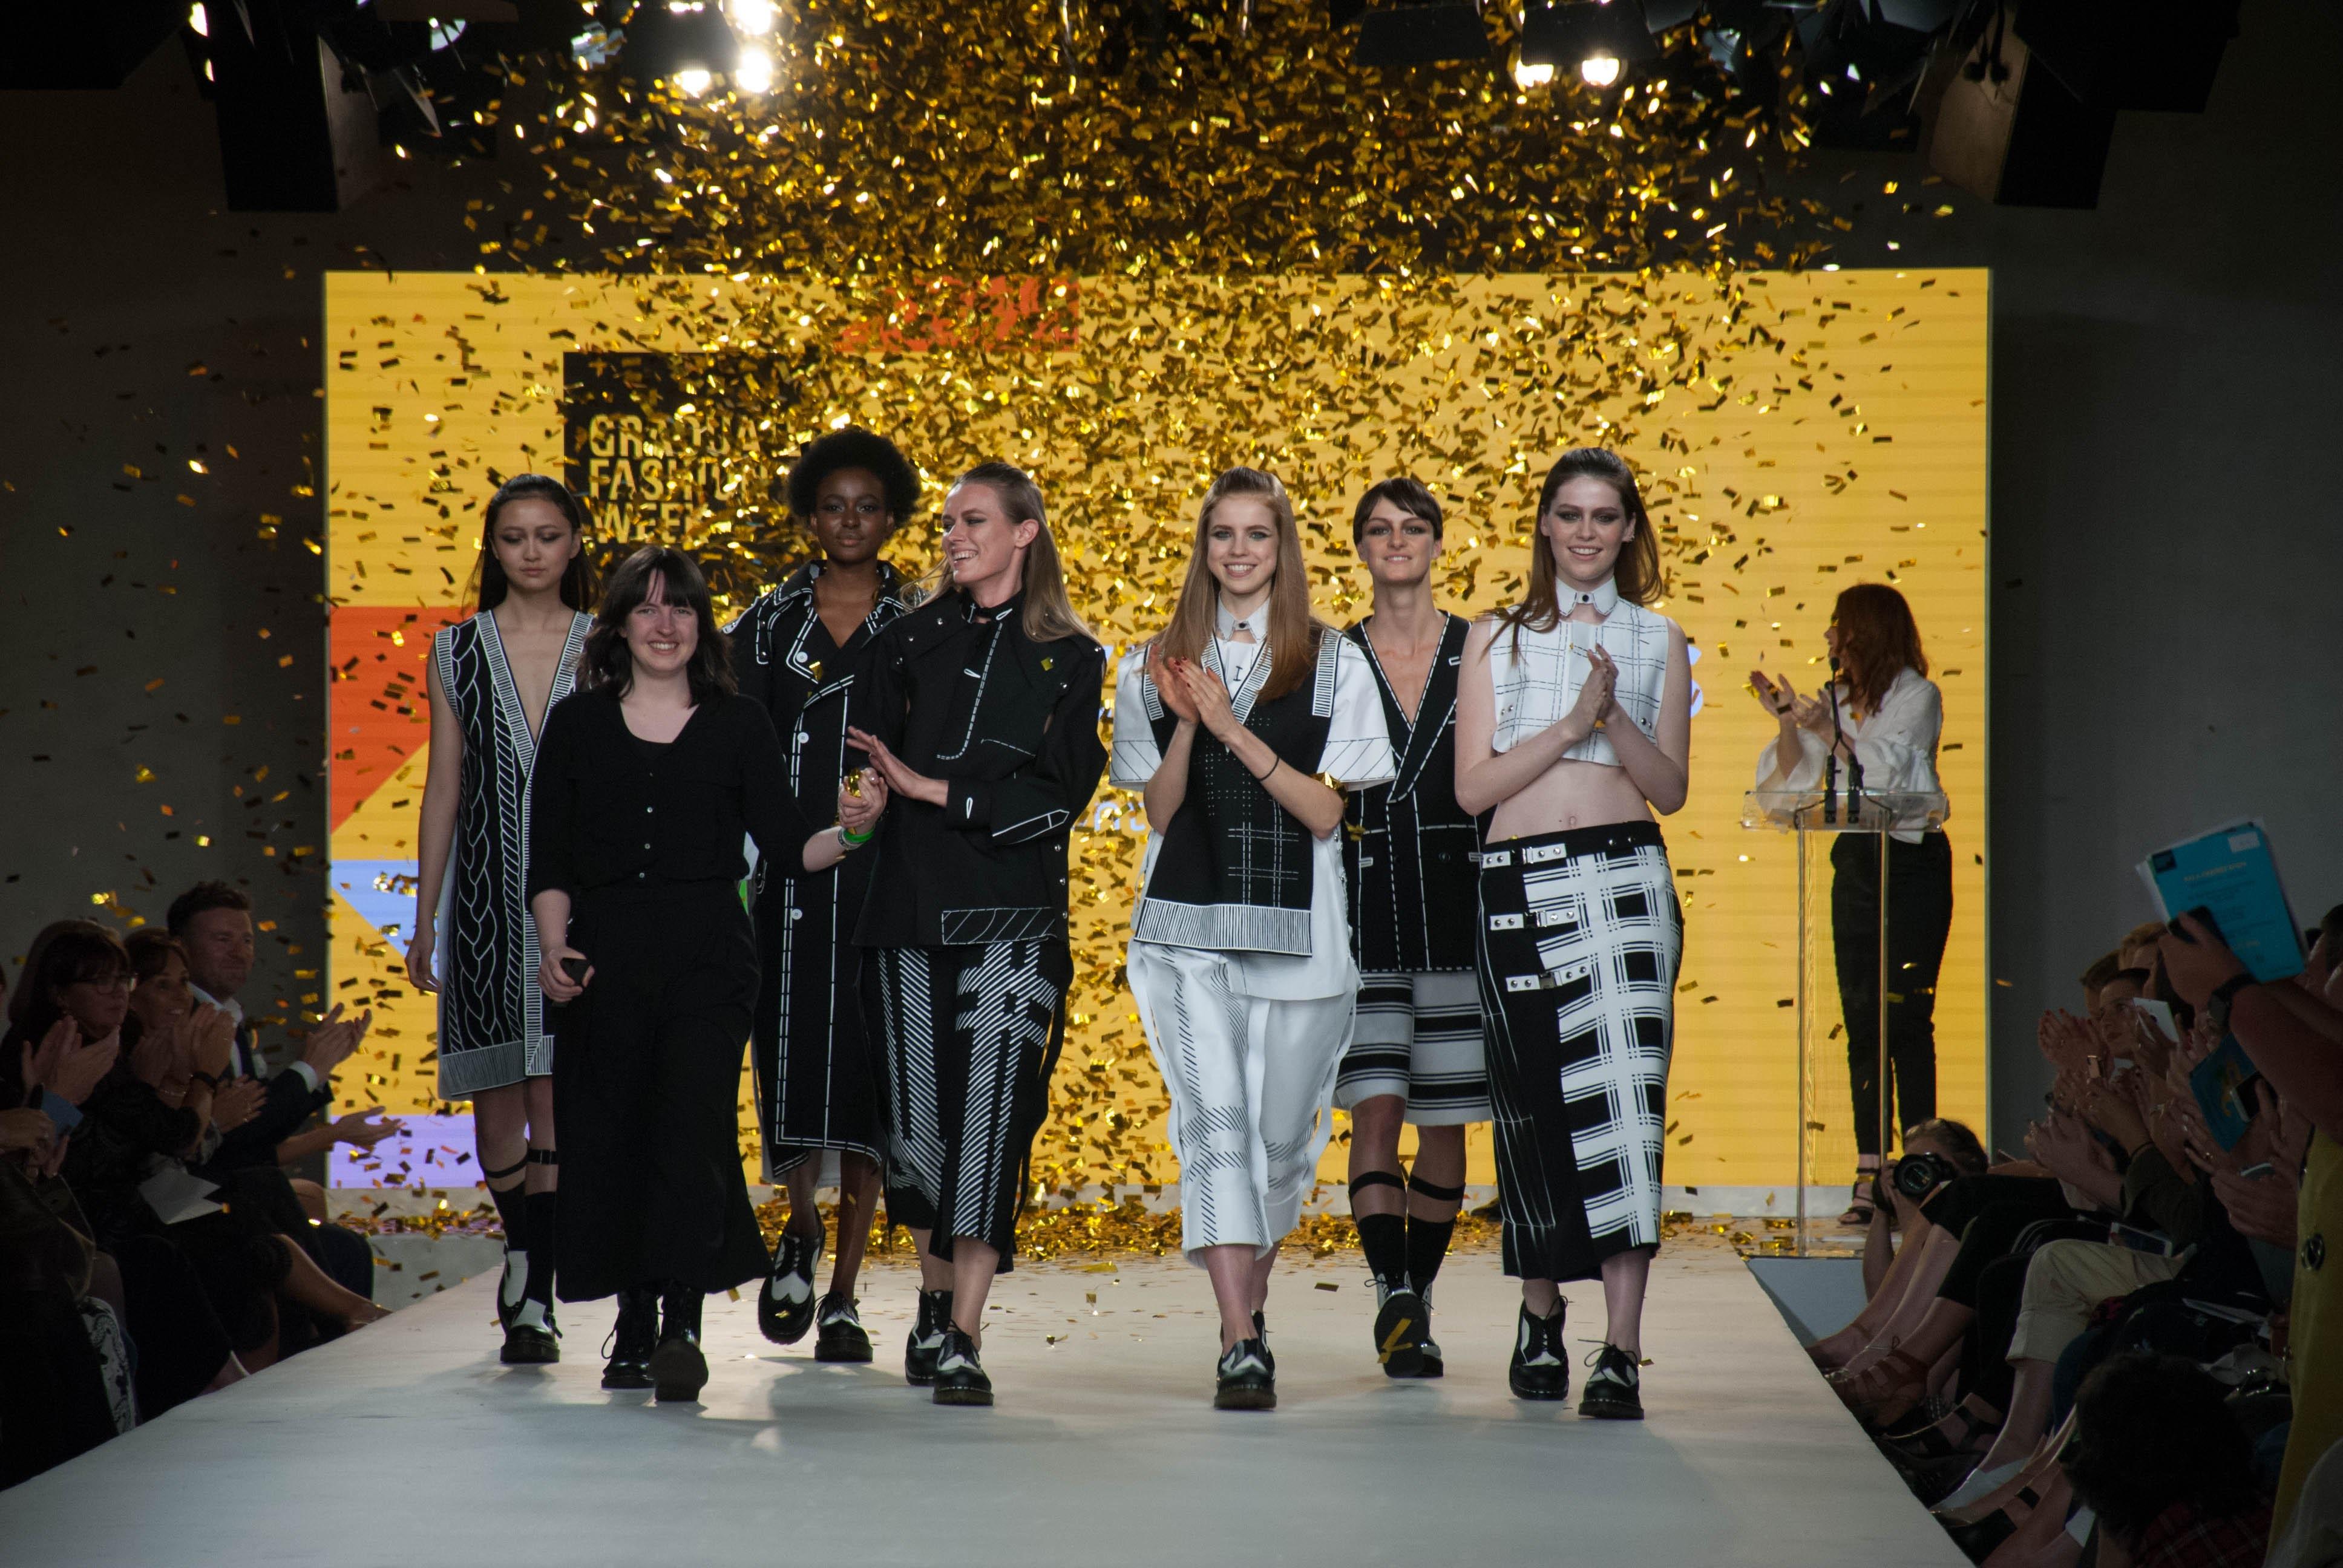 2016 Graduate Fashion Week Gala Show Winner Taine King |  Source: Courtesy